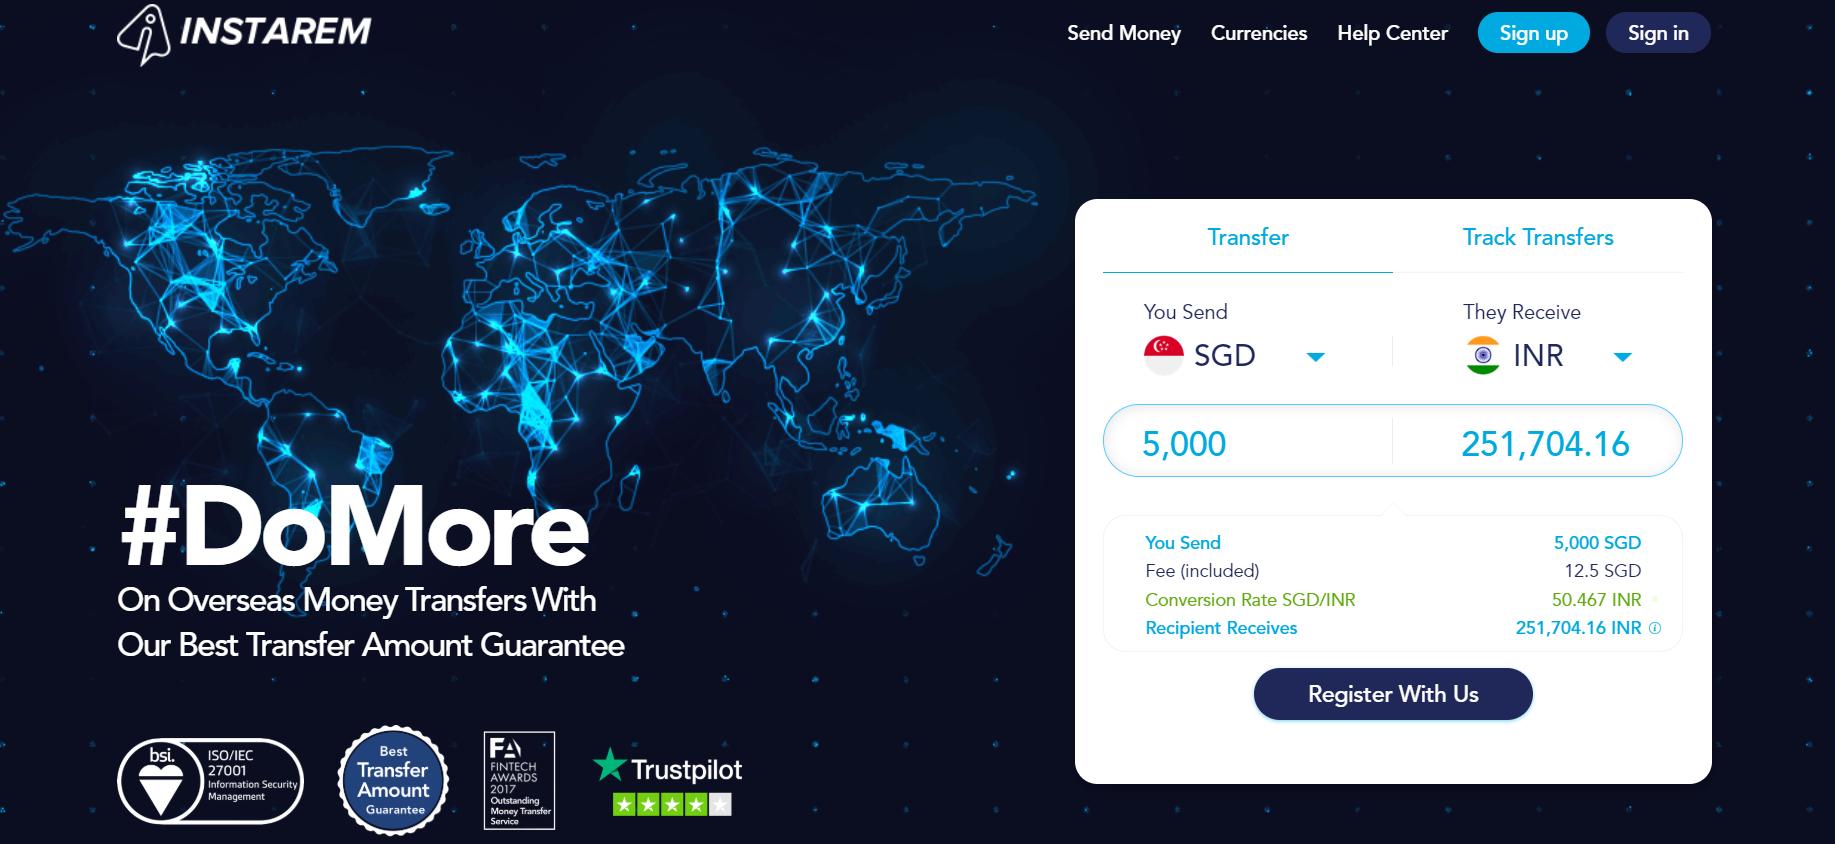 digital nomad traveller singapore fintech app instarem